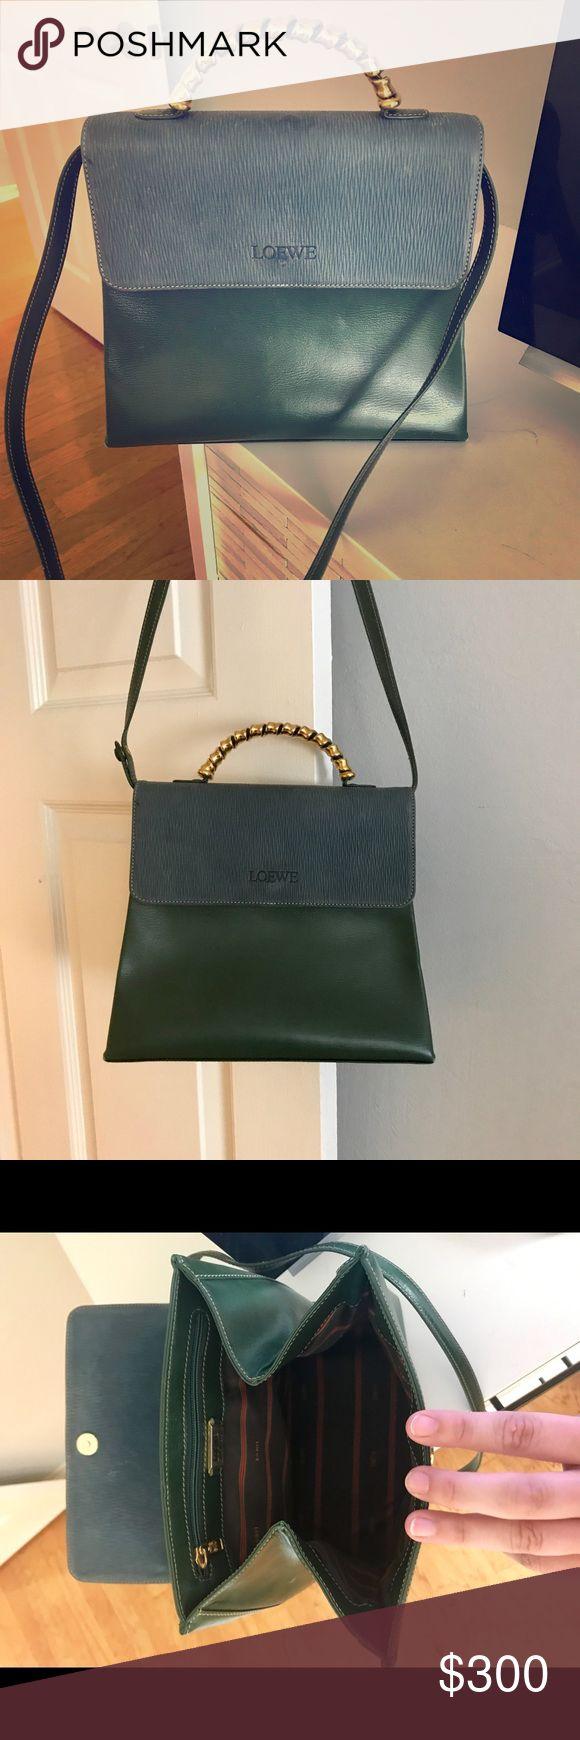 Loewe Shoulder Bag Loewe Hunter Green Shoulder Bag with Handle. Bought in 2015 at Neiman Marcus. In great condition! Loewe Bags Shoulder Bags